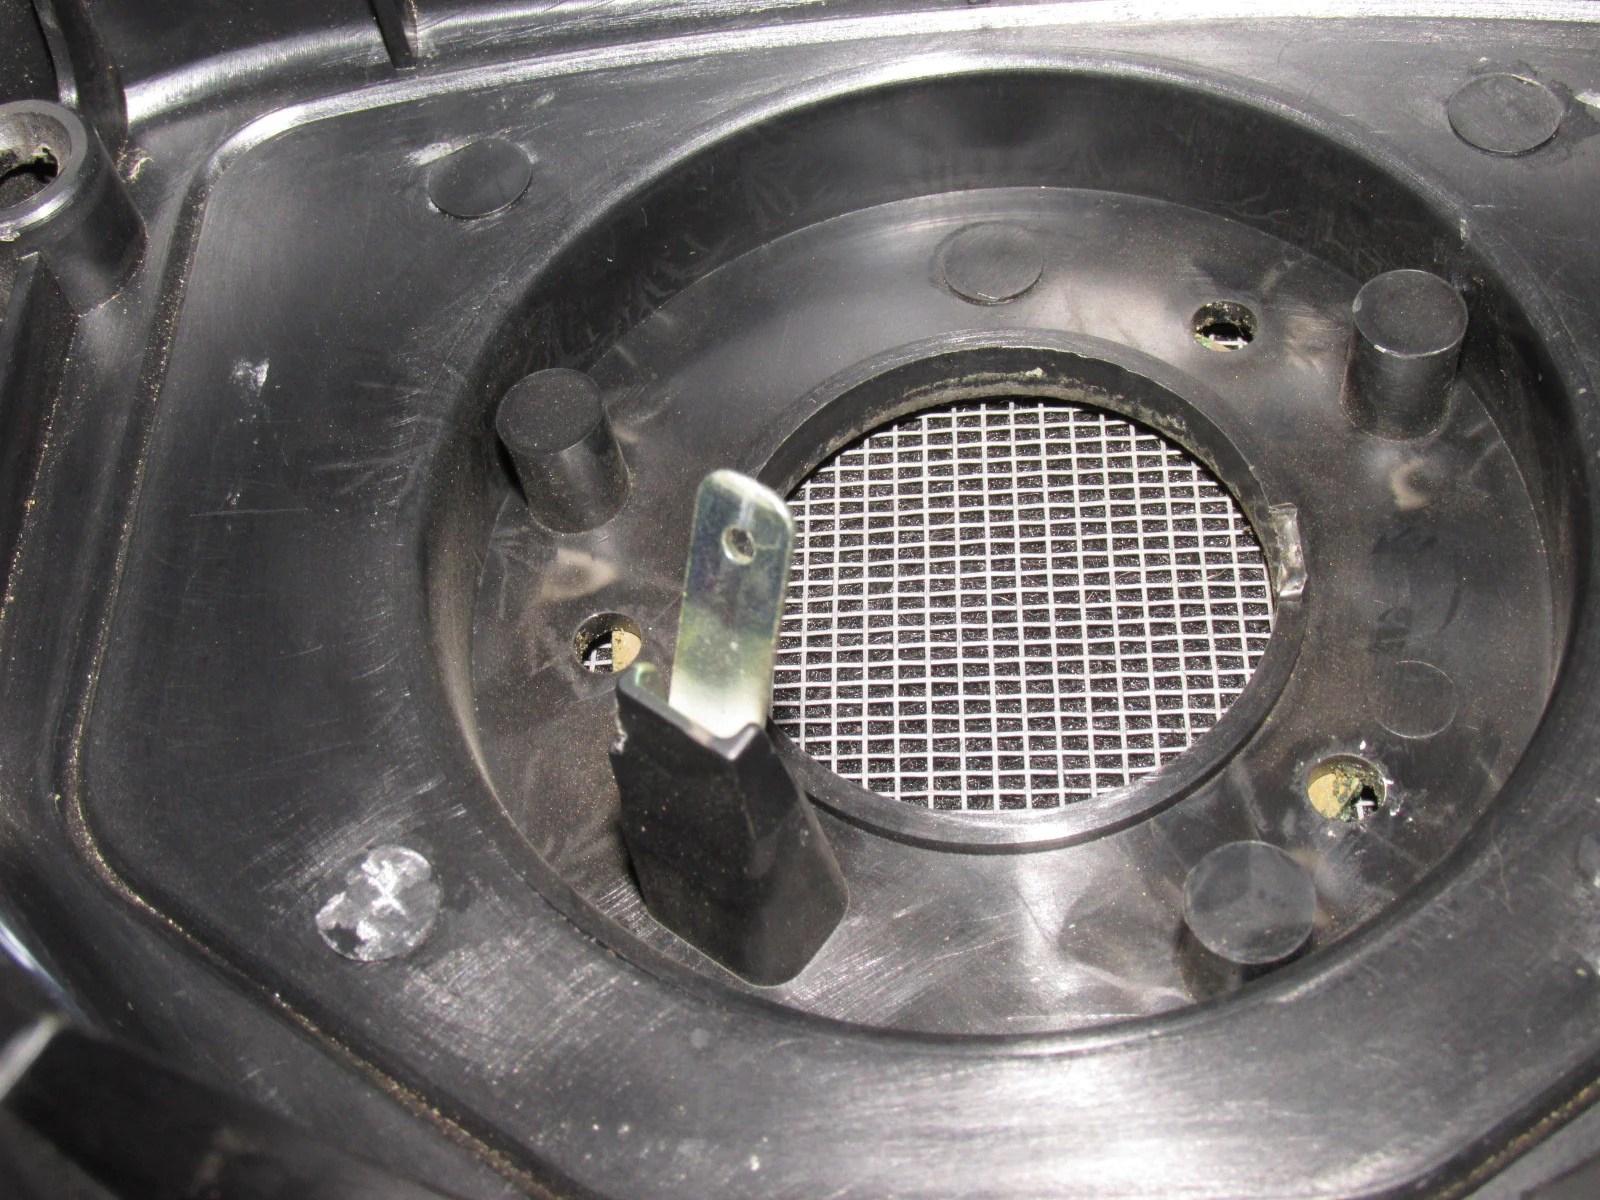 87 88 89 toyota mr2 oem steering wheel rear horn cover [ 1600 x 1200 Pixel ]